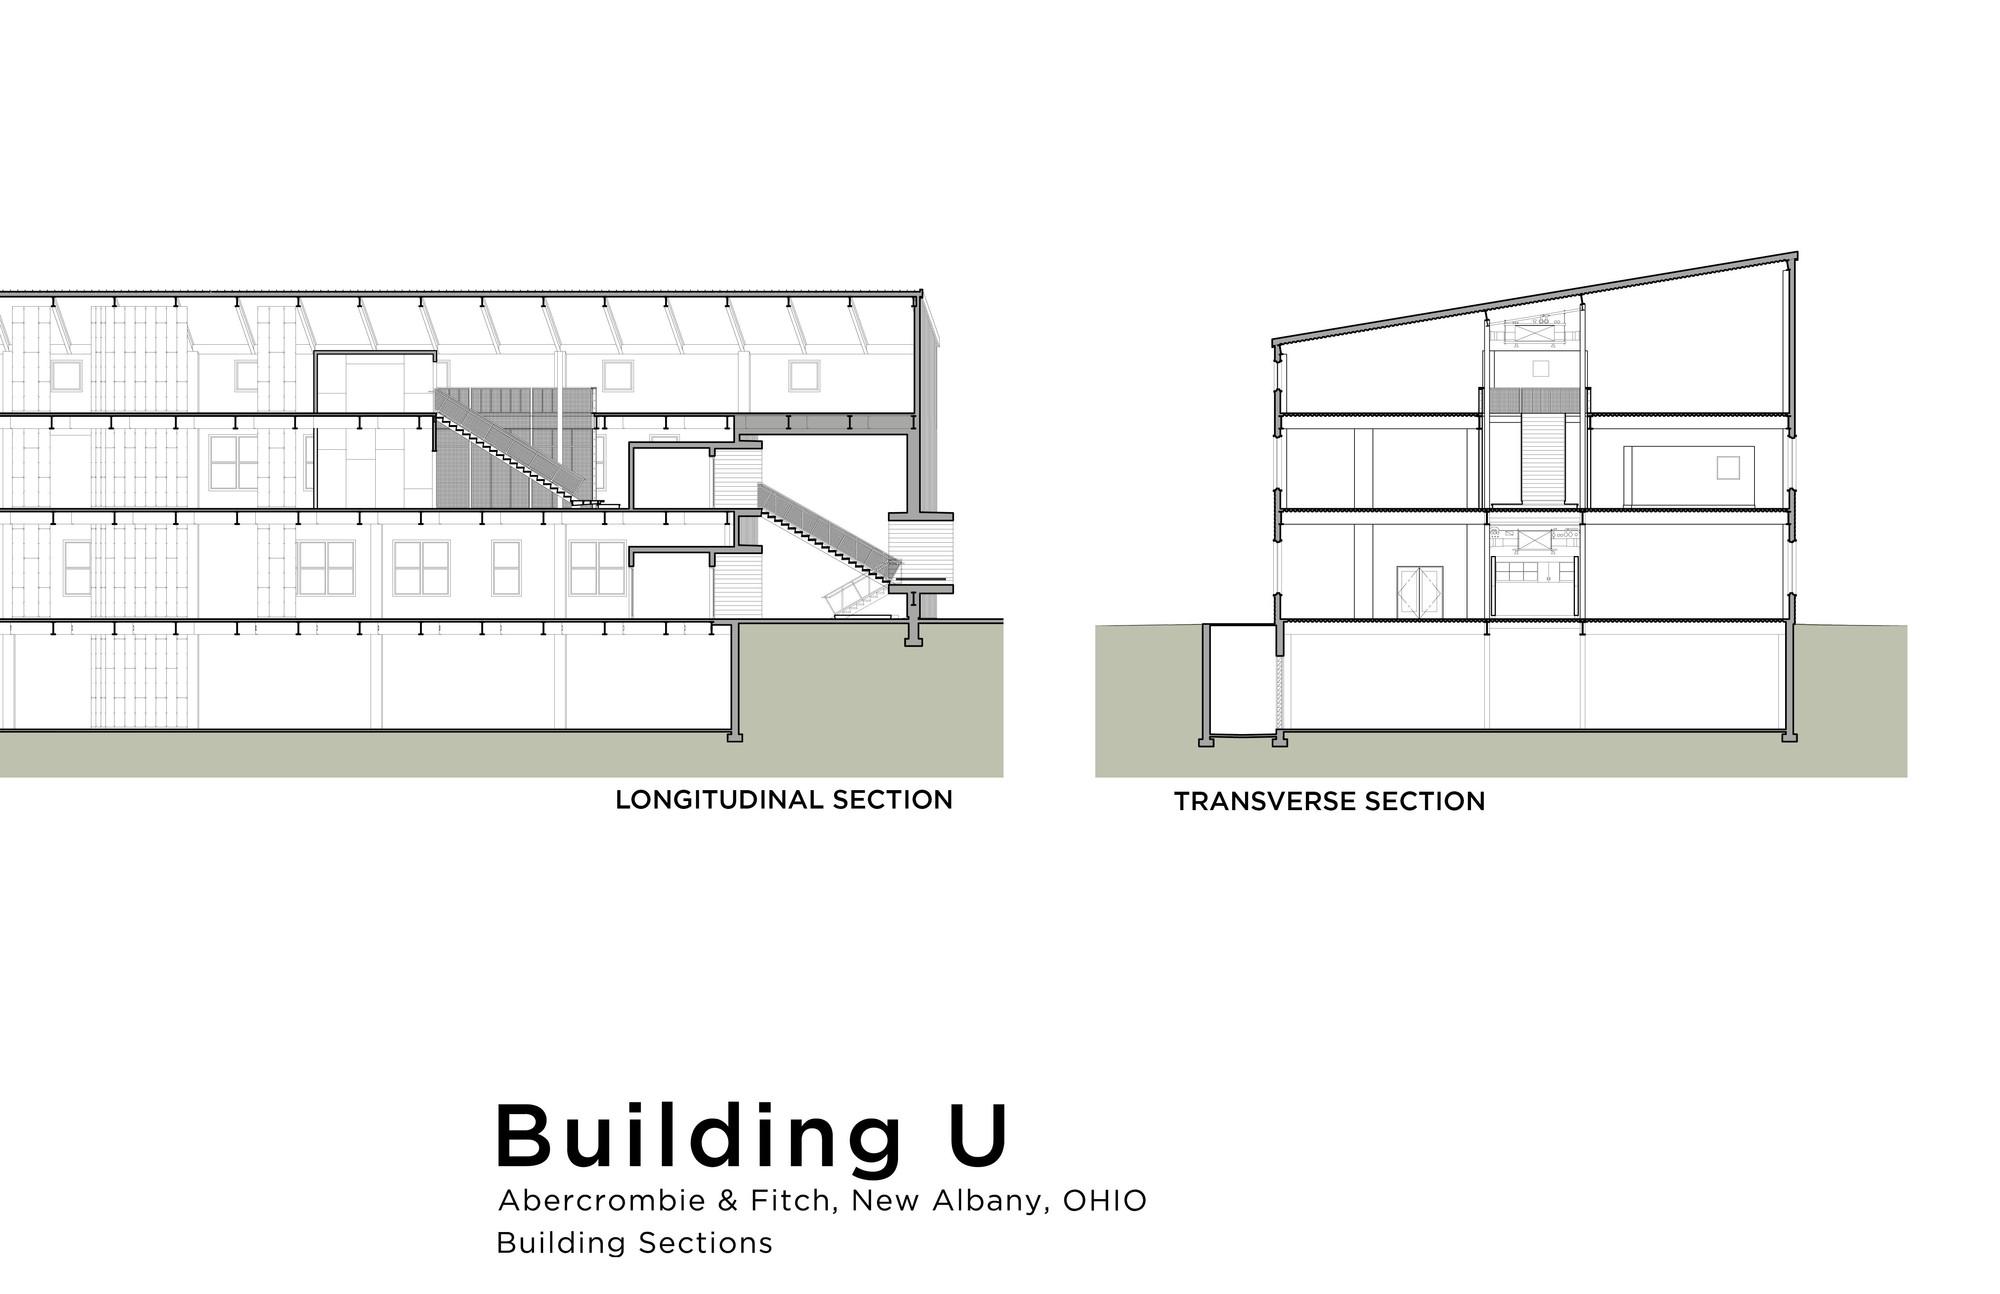 Abercrombie Amp Fitch Building U Mj Sagan Architecture